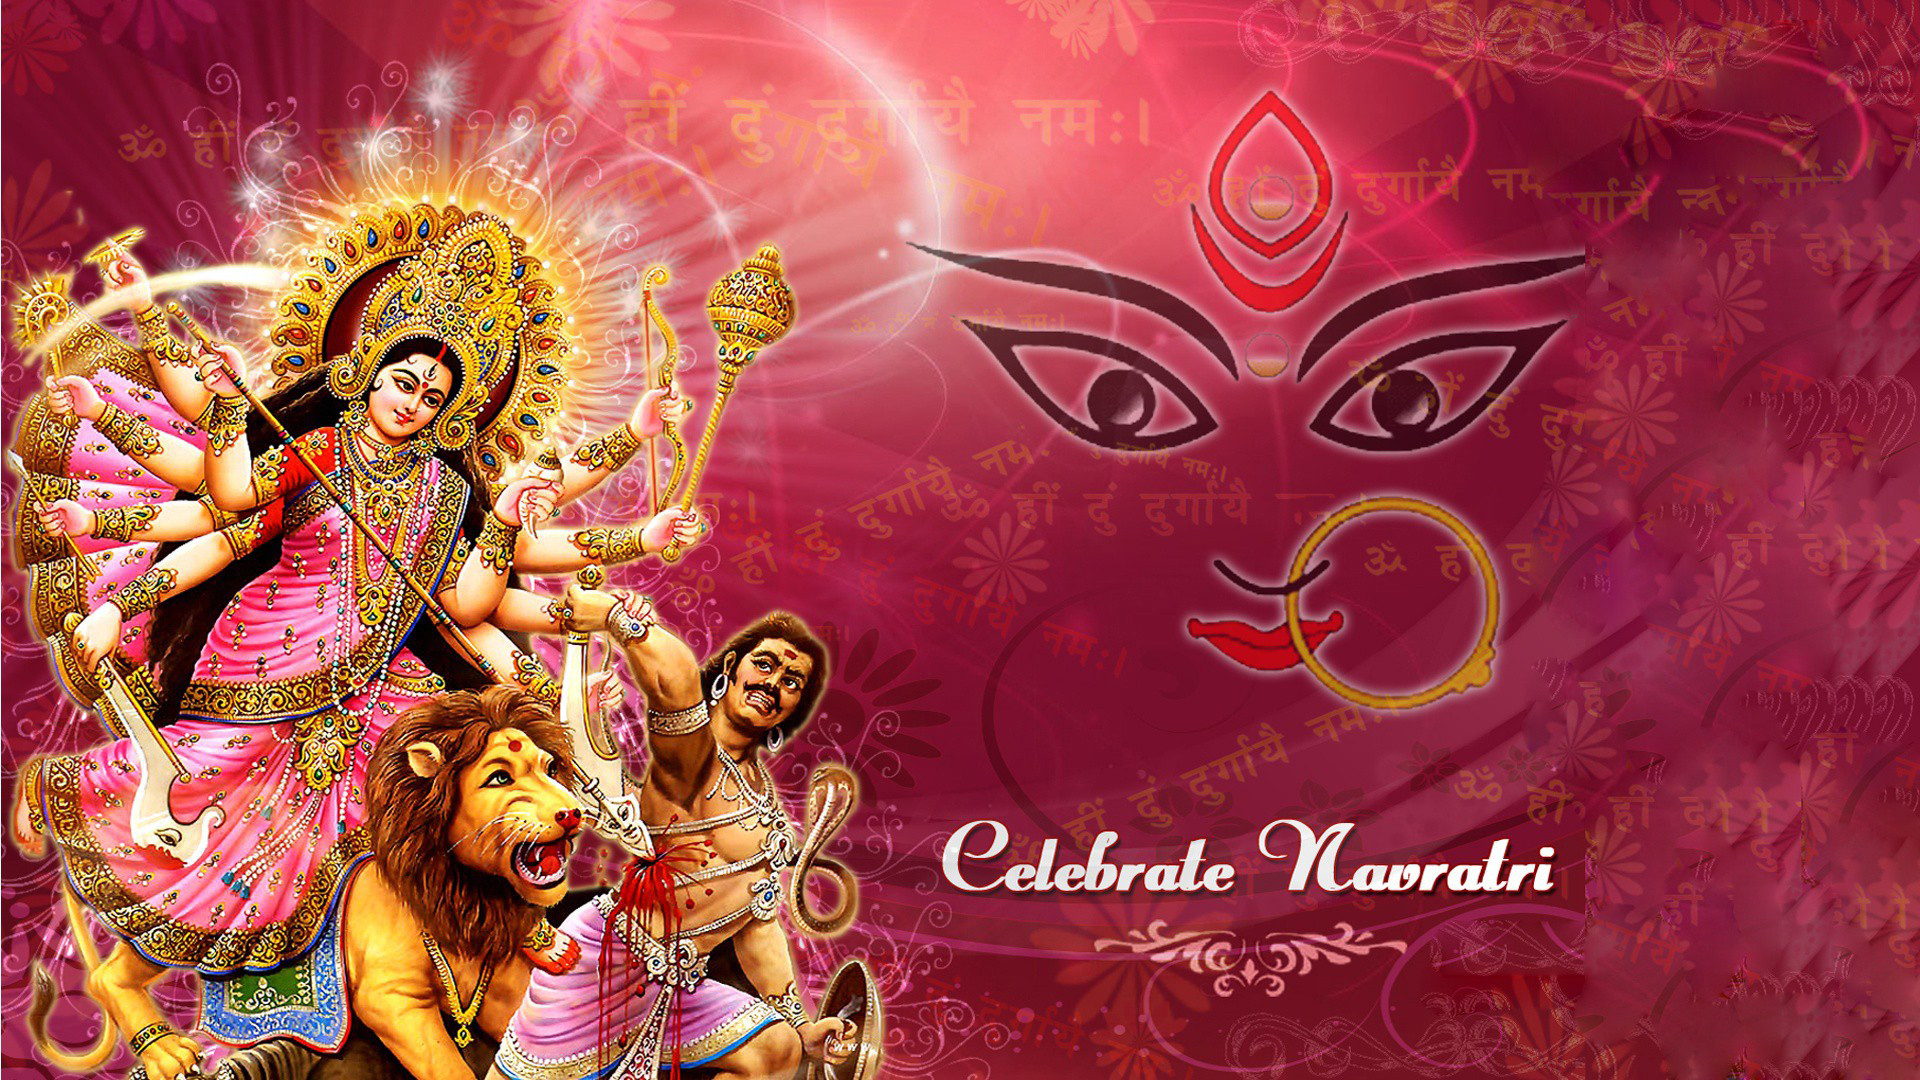 Res: 1920x1080, Navratri Maa Durga HD Images Wallpapers Free Download